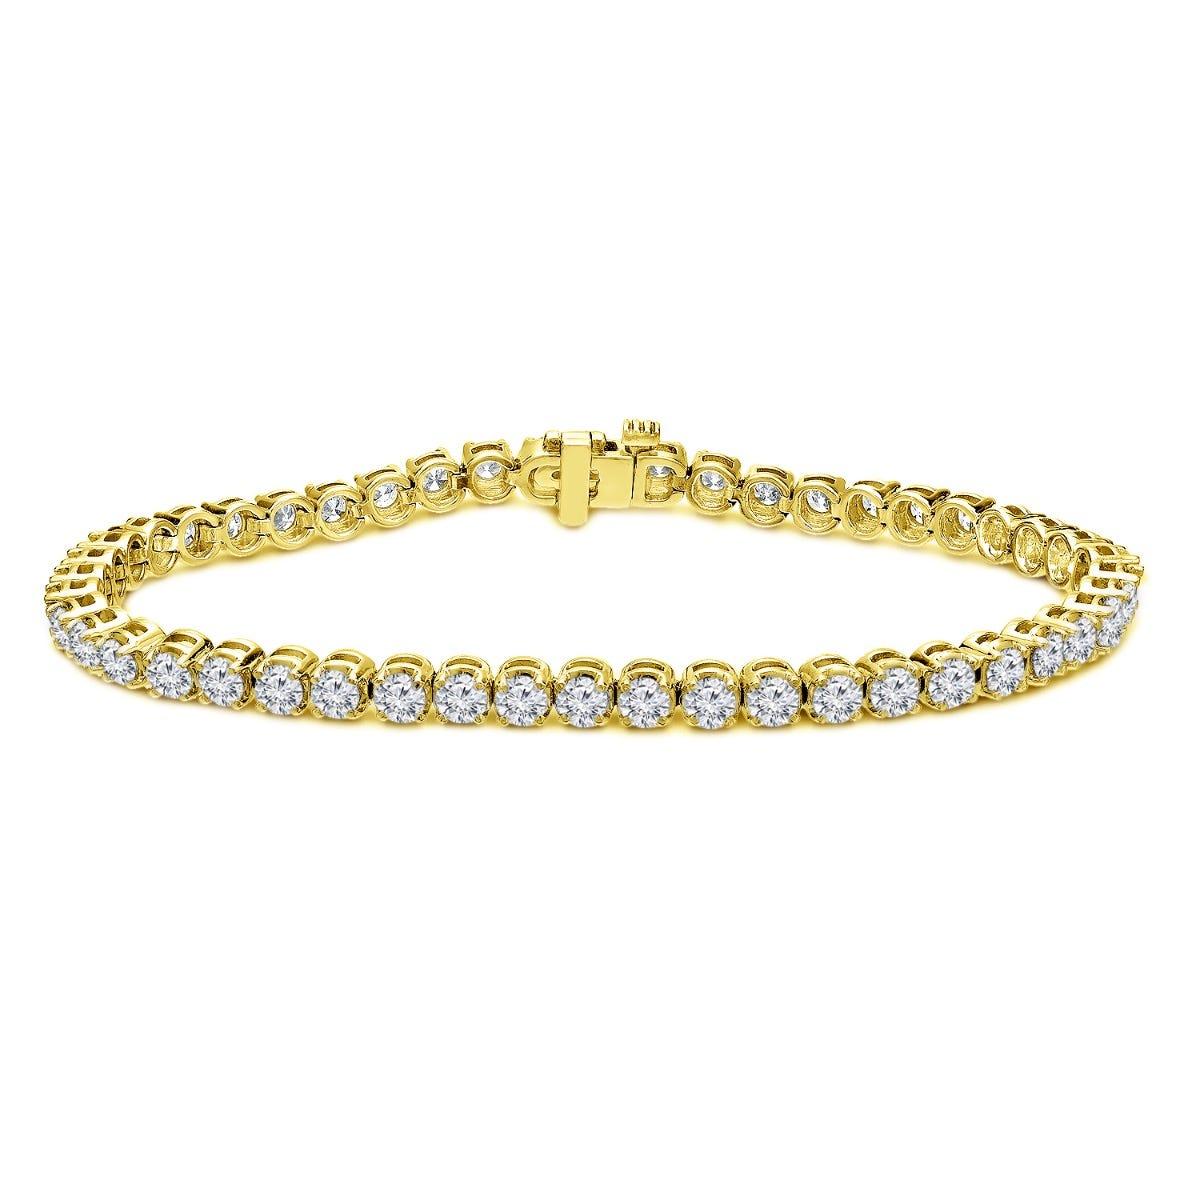 4ctw. 4-Prong Round Link Diamond Tennis Bracelet in 14K Yellow Gold (IJ, I1-I2, 48-Stone)